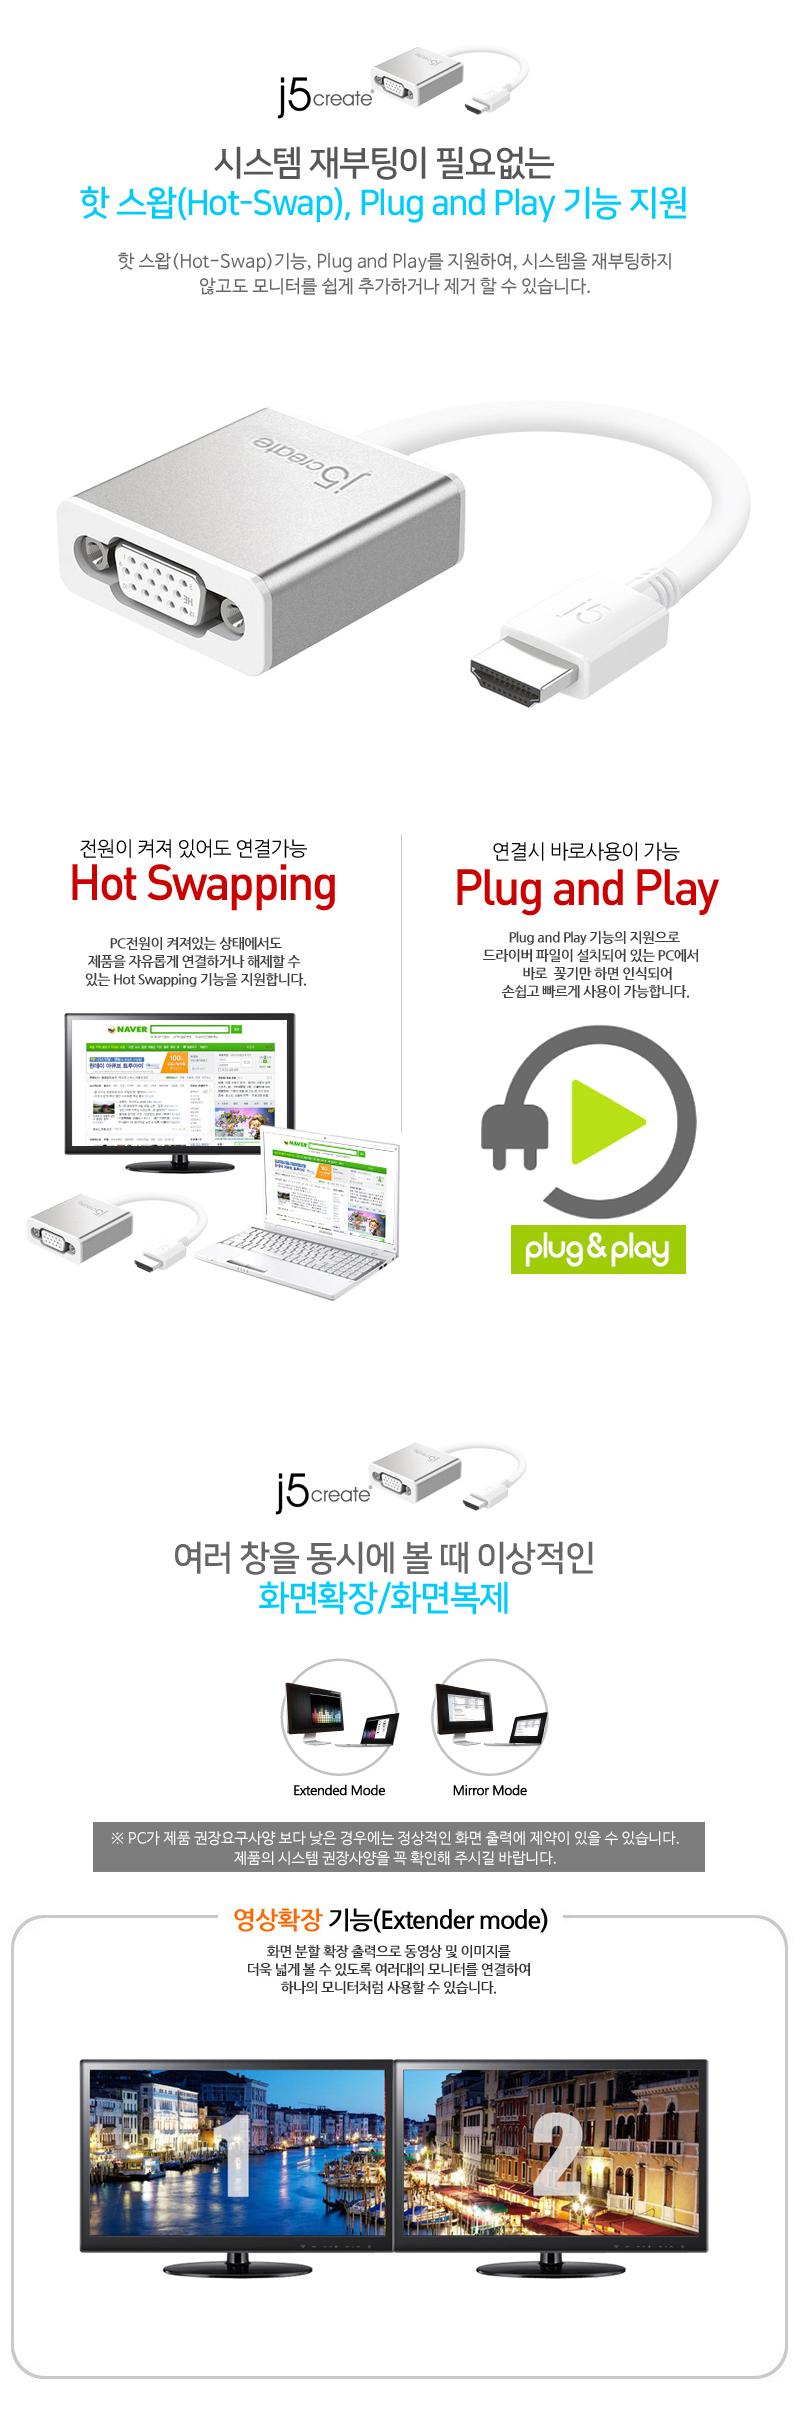 j5create HDMI to VGA 비디오 어댑터 (JDA213S)